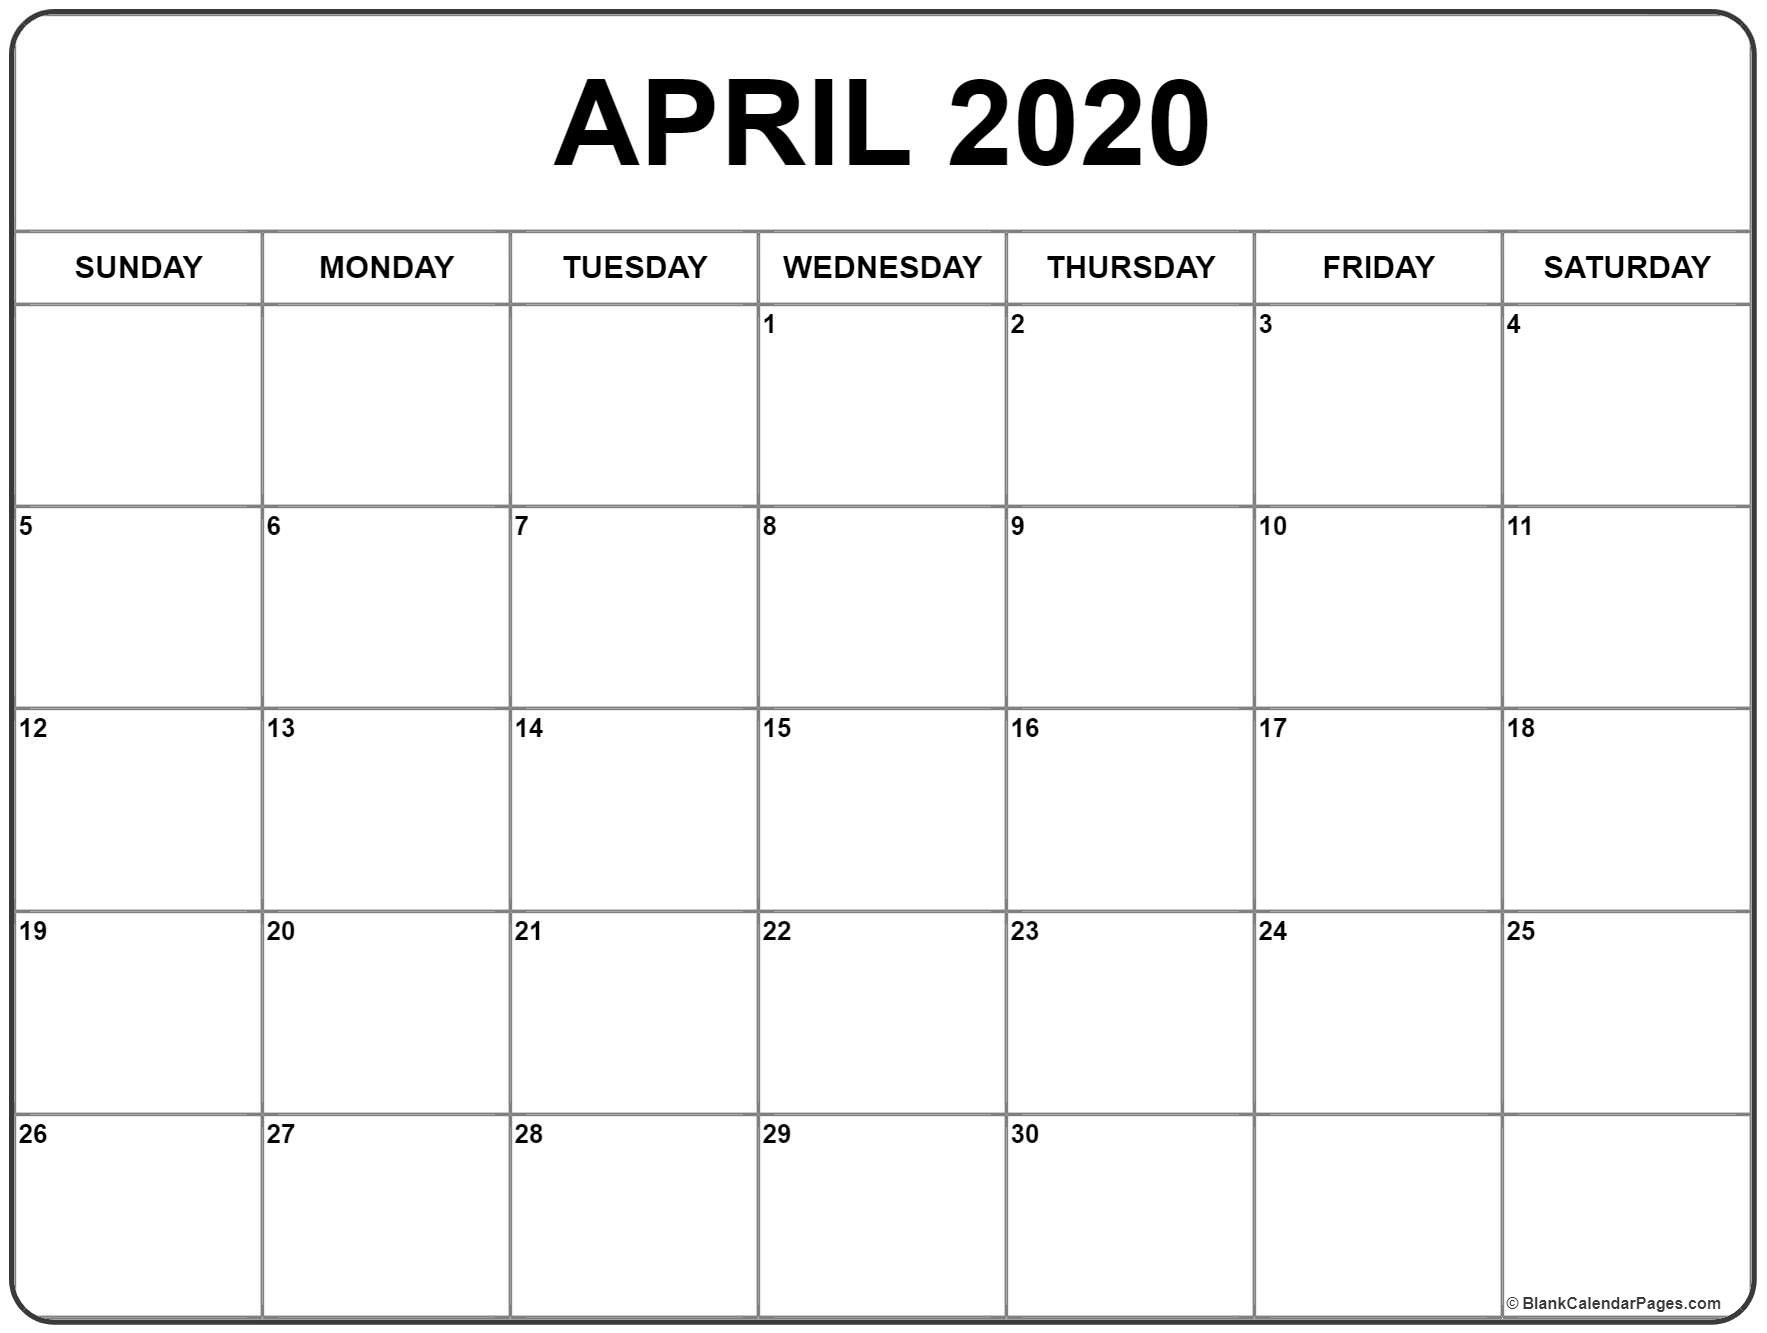 April 2020 Calendar   Free Printable Monthly Calendars-Blank 2020 Calendar Printable 2 Month